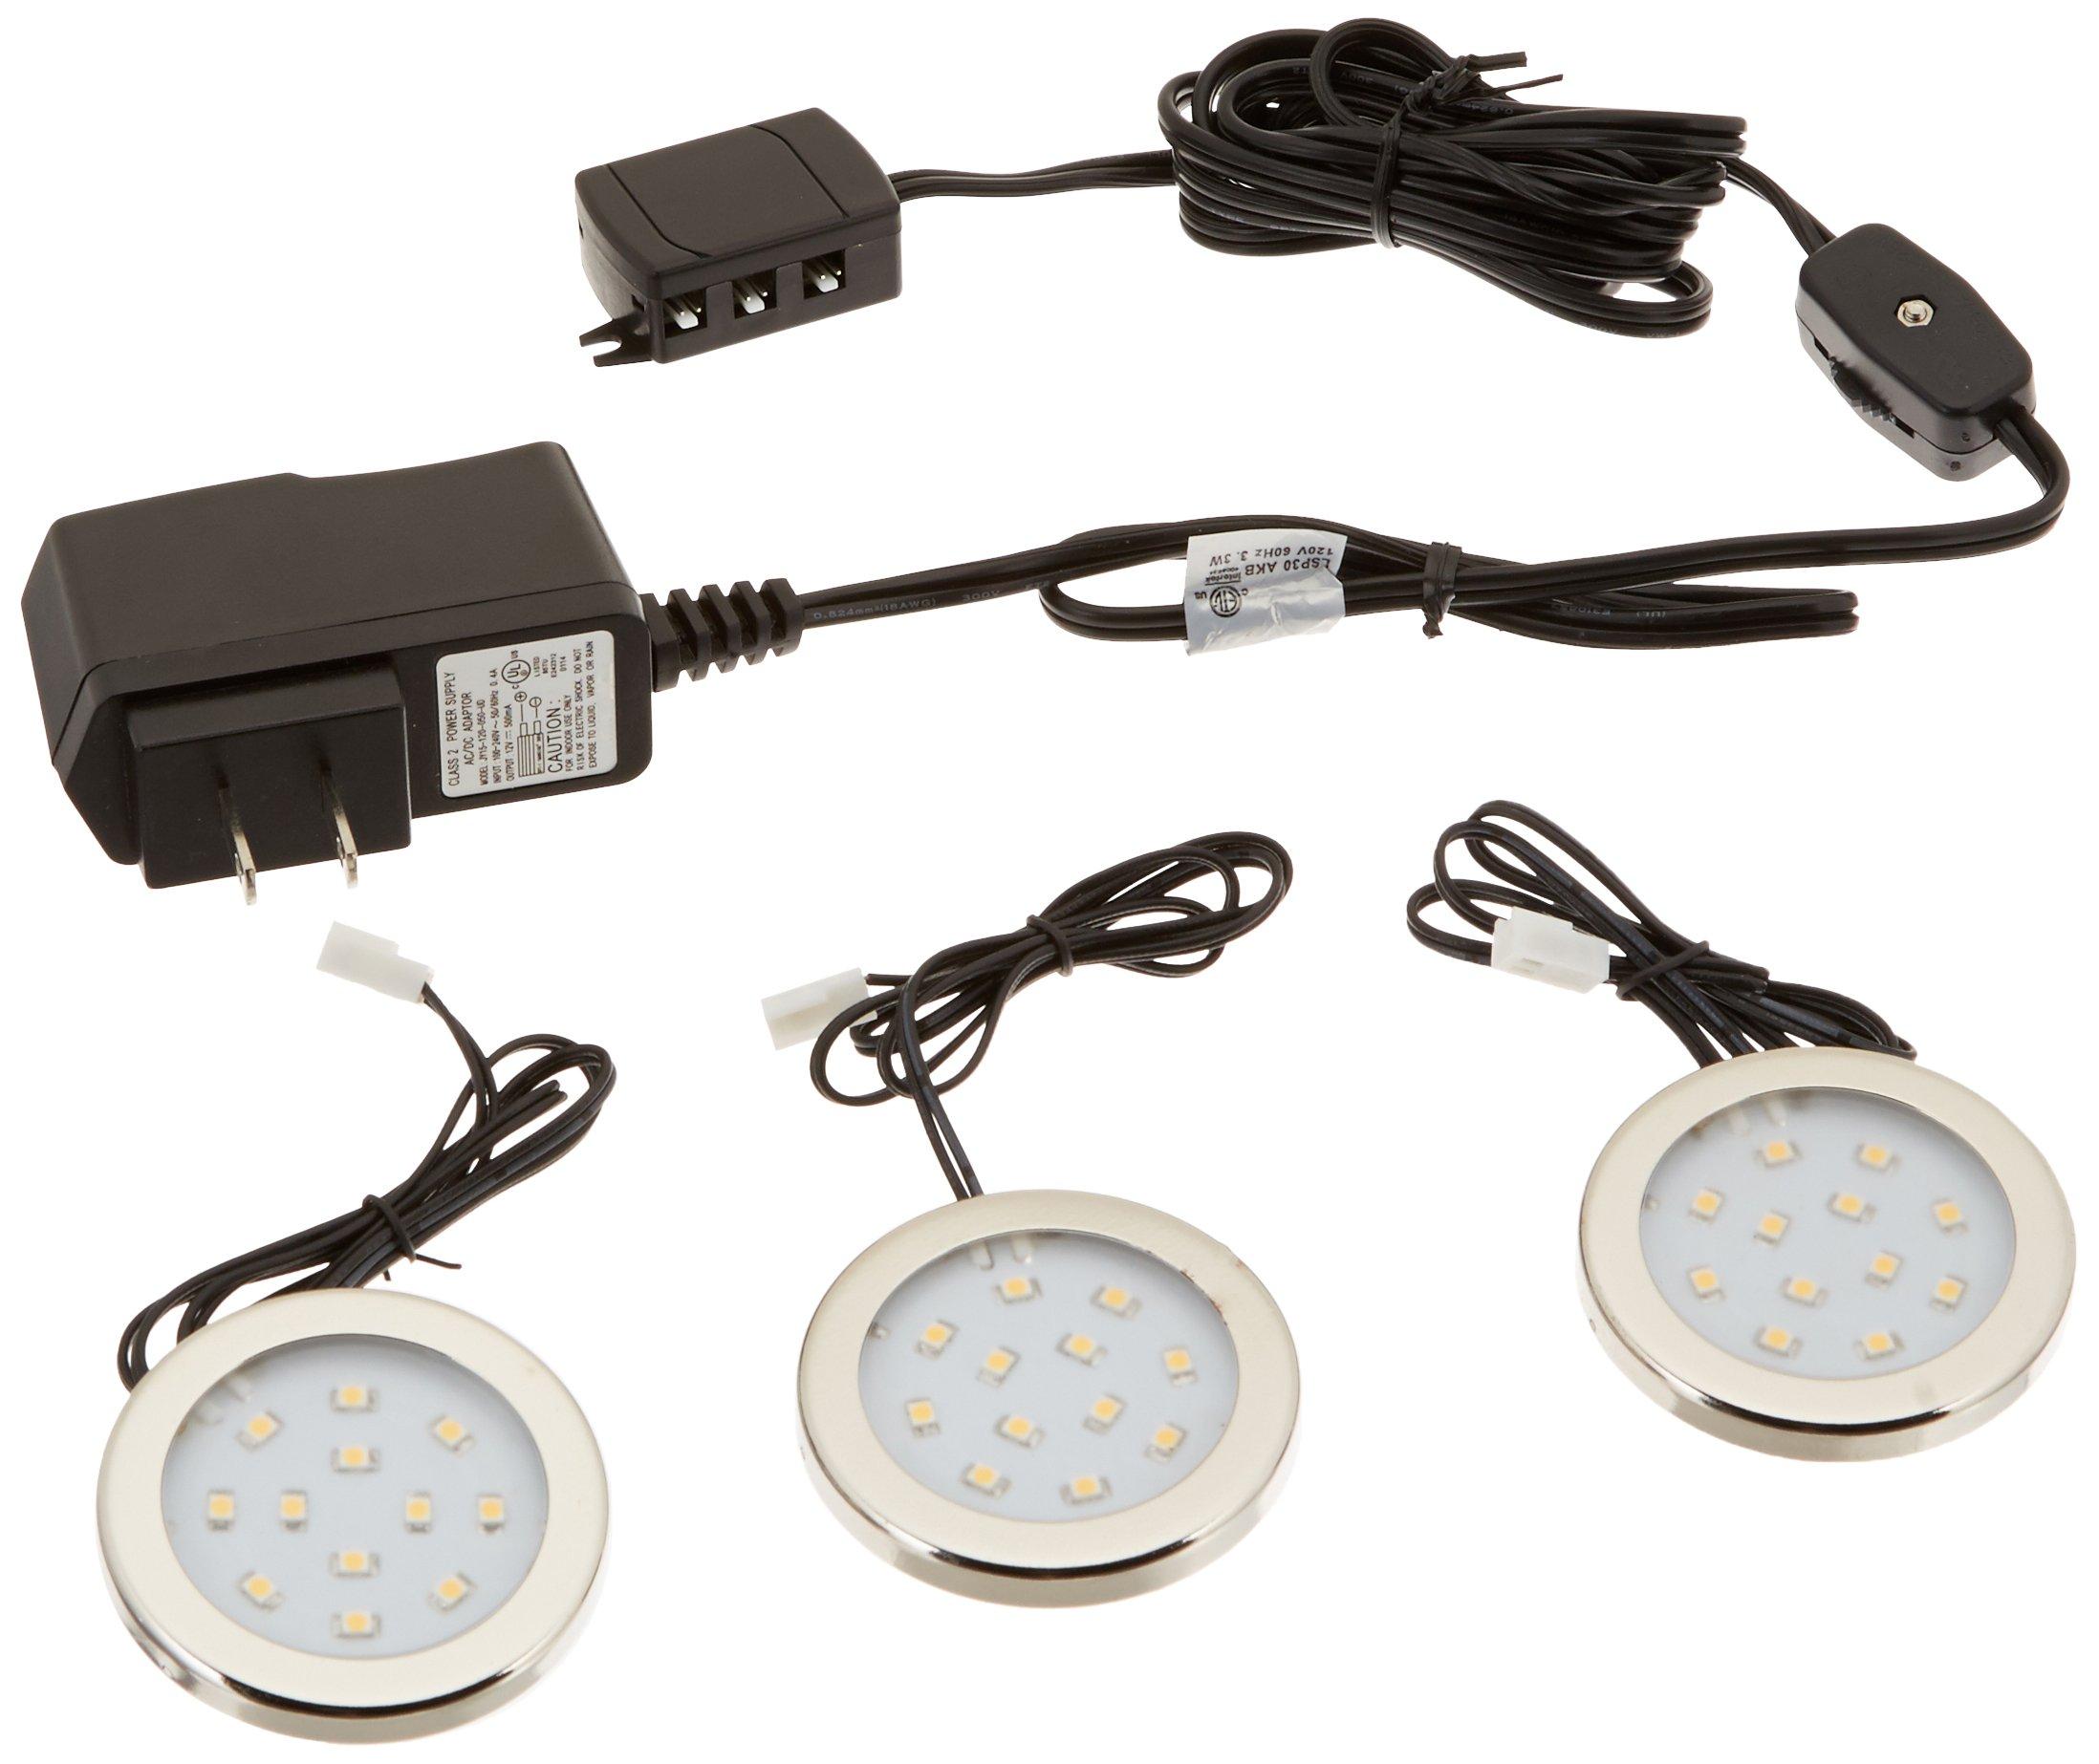 Westek LED Surface Mount Accent Lighting Kit 3 Pack 12V